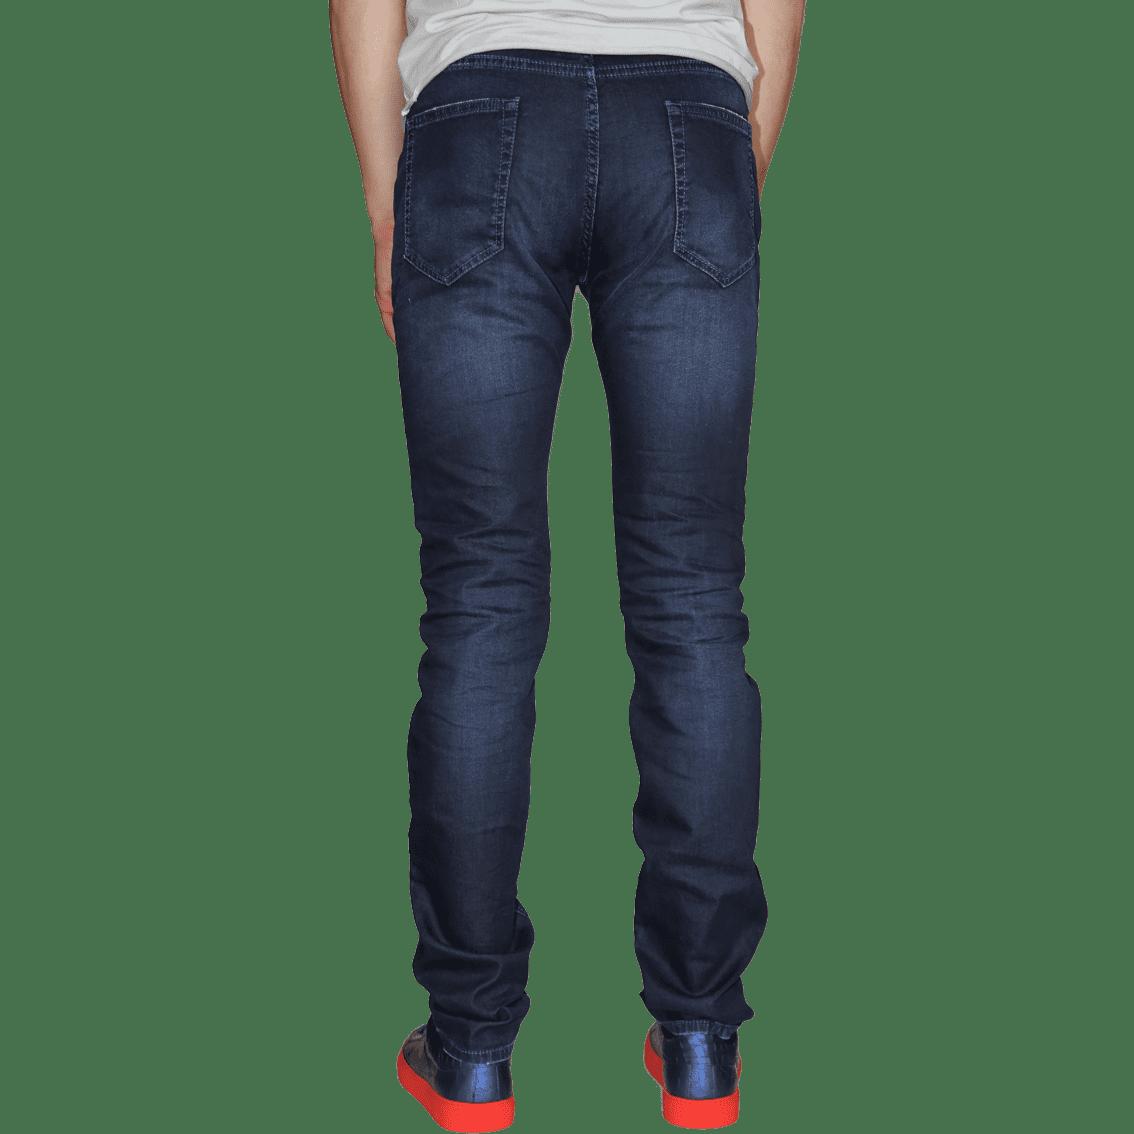 Cabinero Stiles Berlin PG Enjoy Jeans, Herrenhosen, made in Italy AW17-18 denim Blue-Blue 17-4